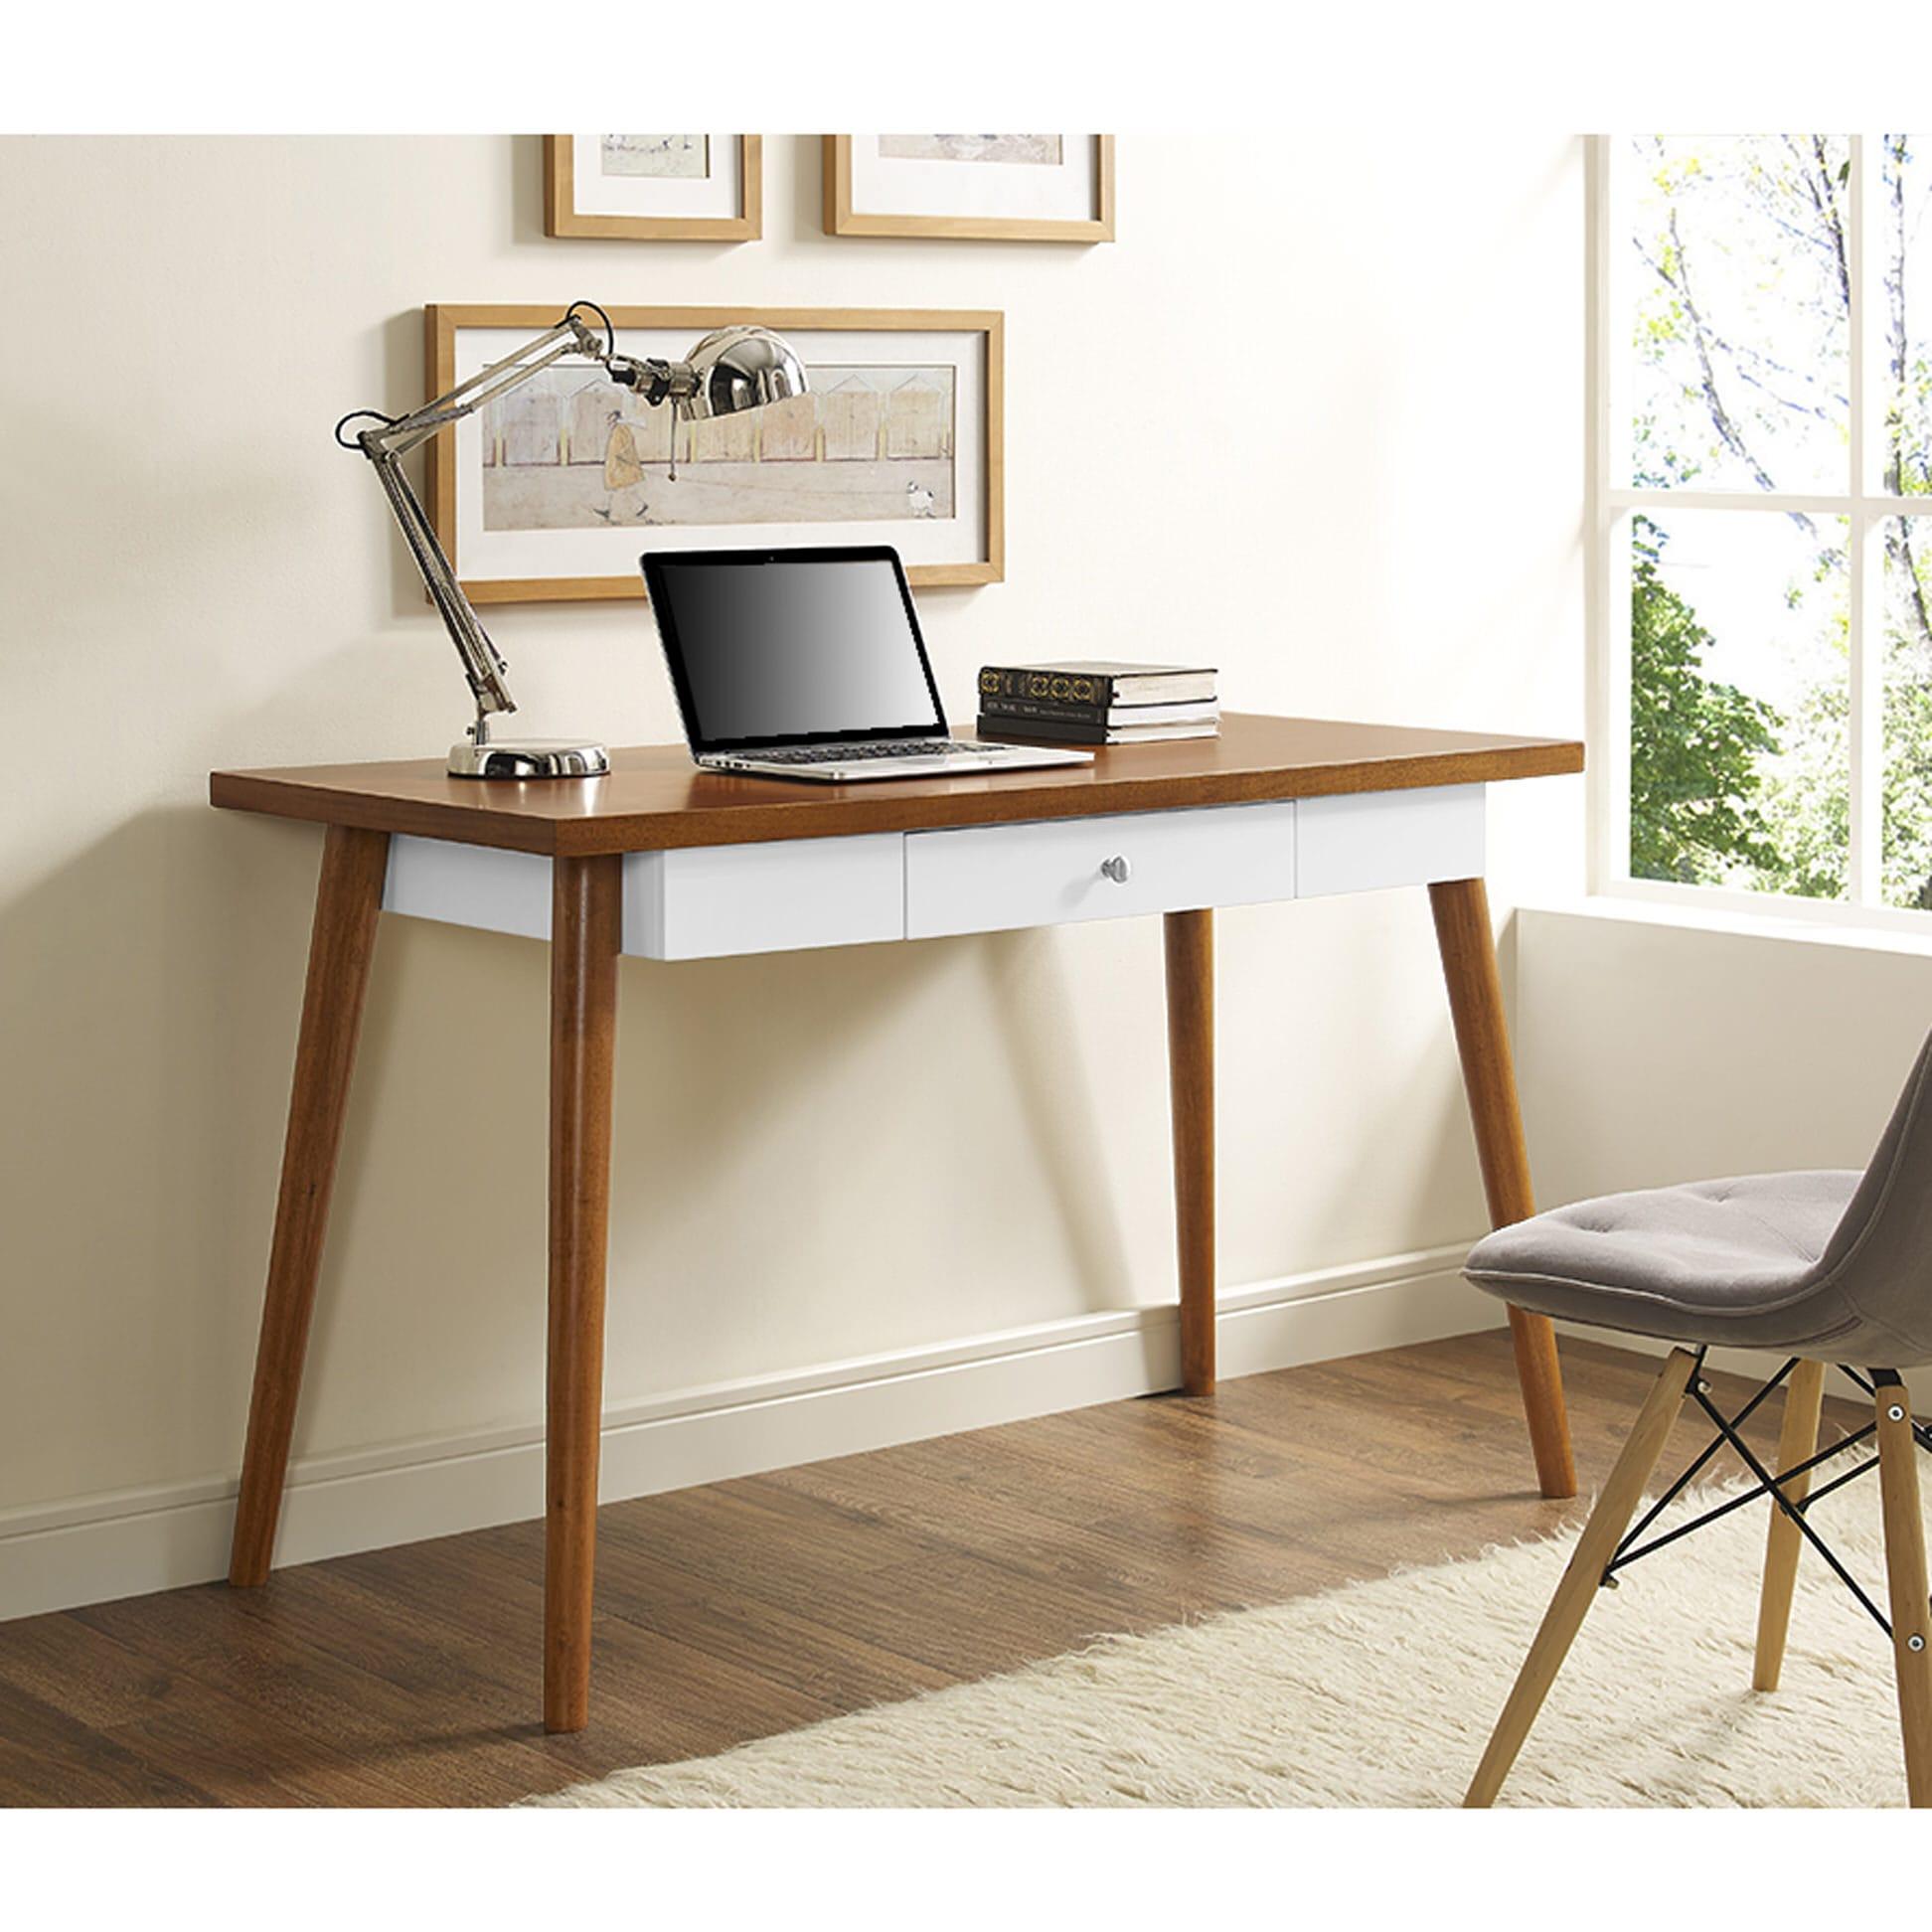 48 Inch Mid Century Wood Computer Desk By Walker Edison